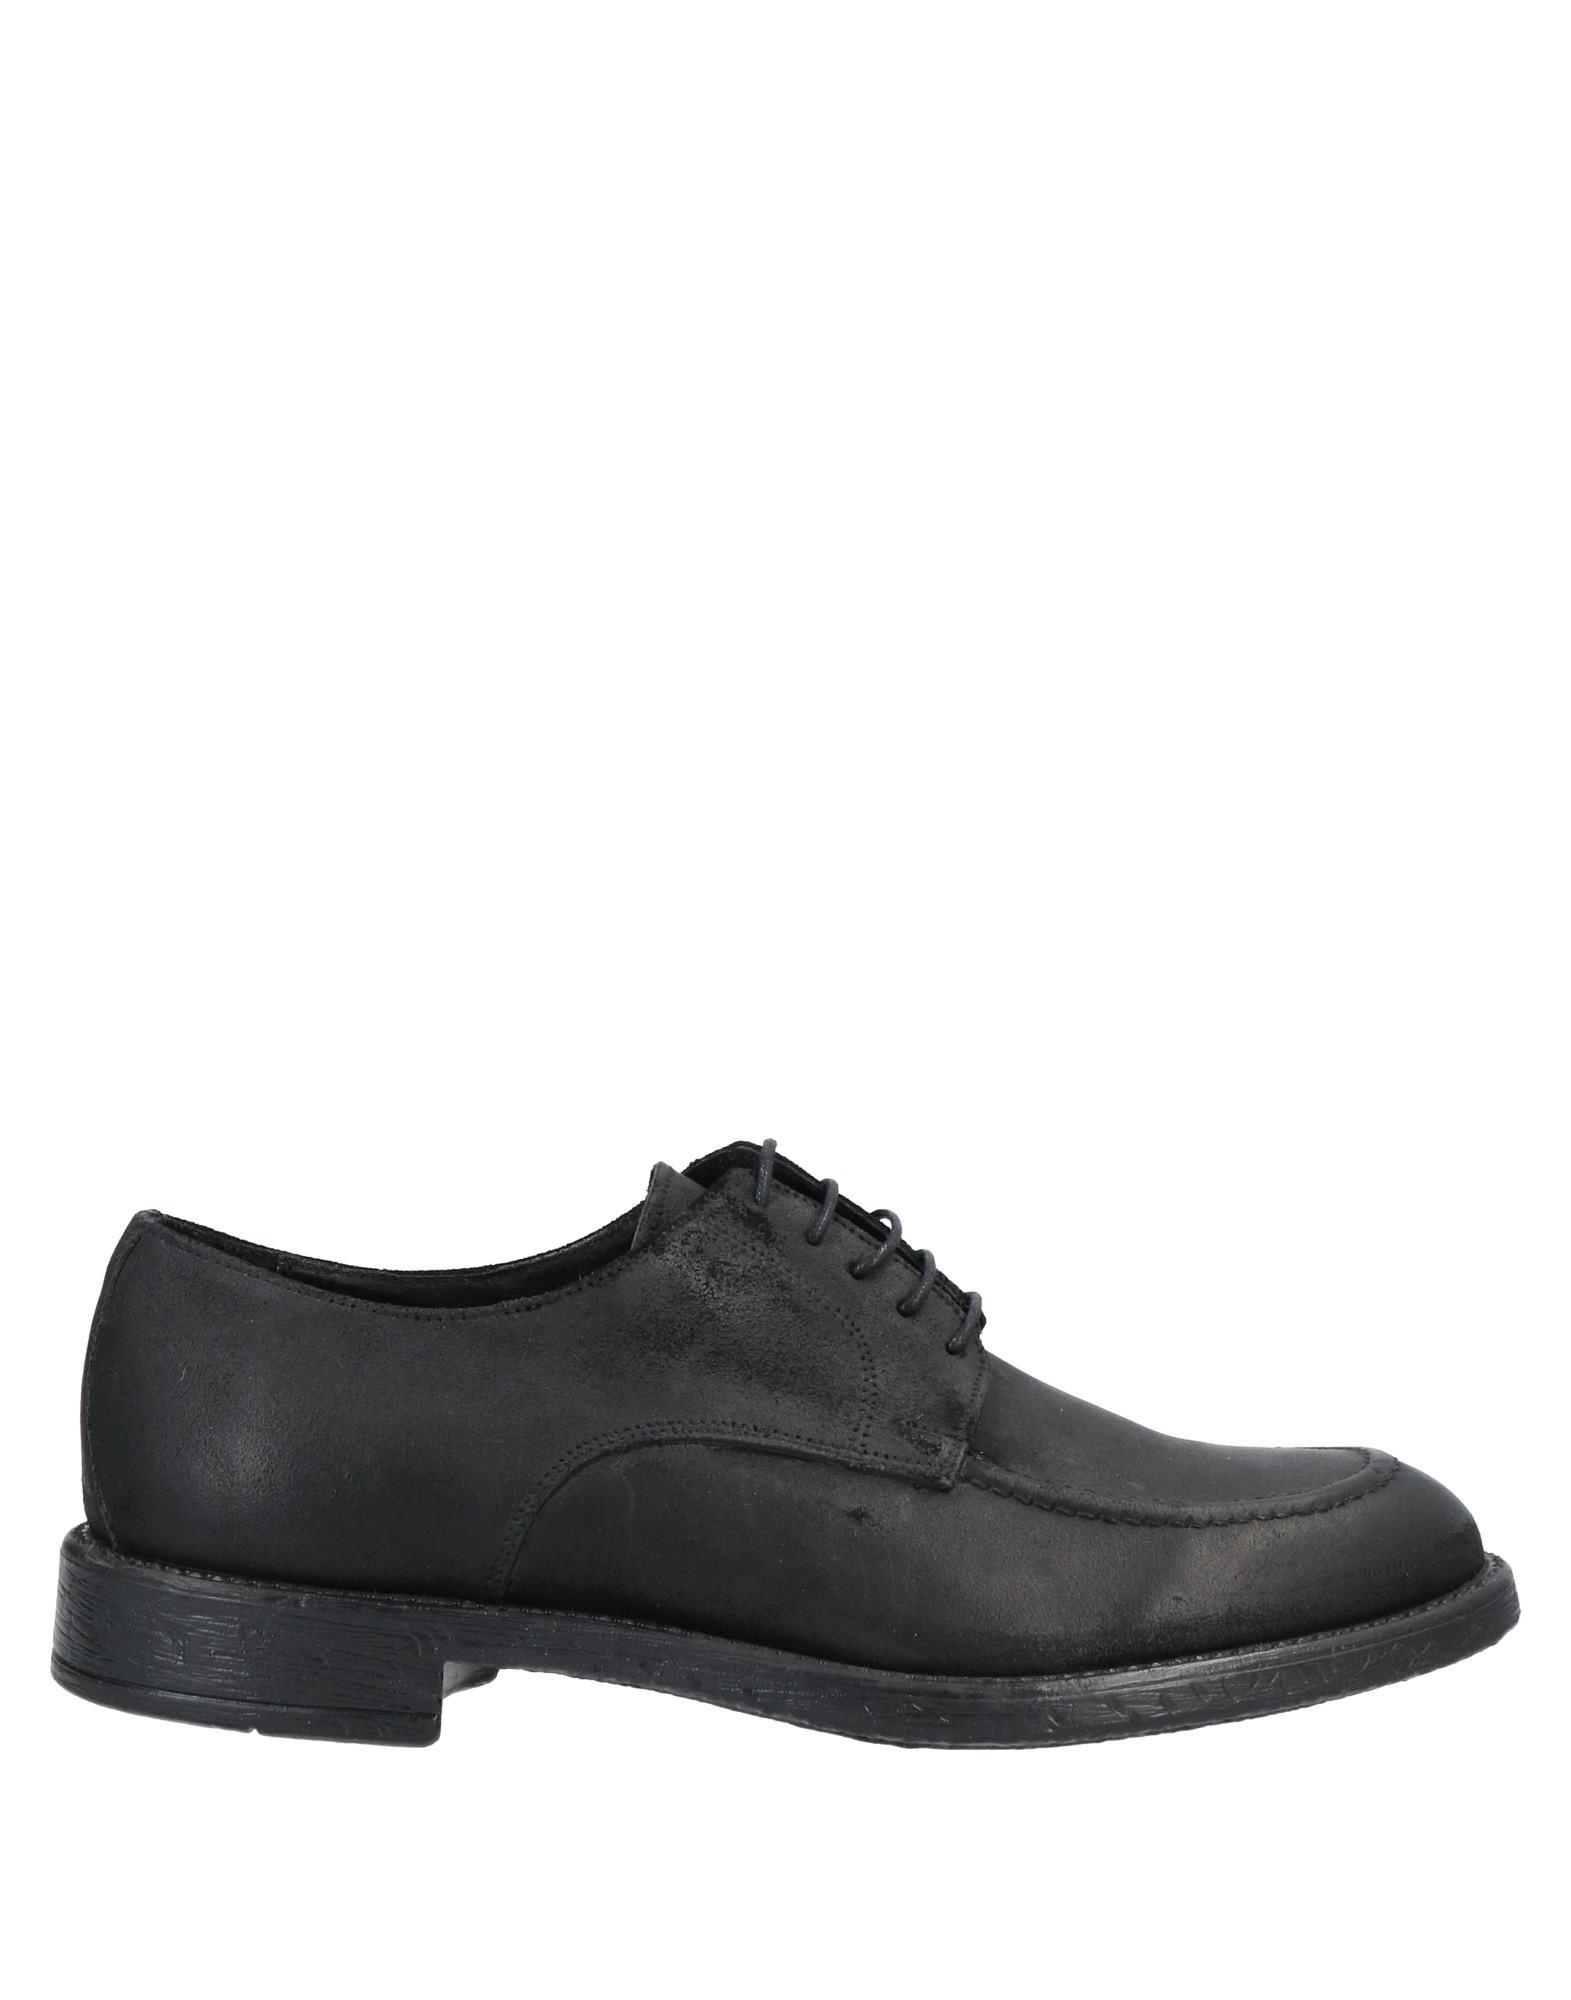 DANIELE ALESSANDRINI HOMME Обувь на шнурках